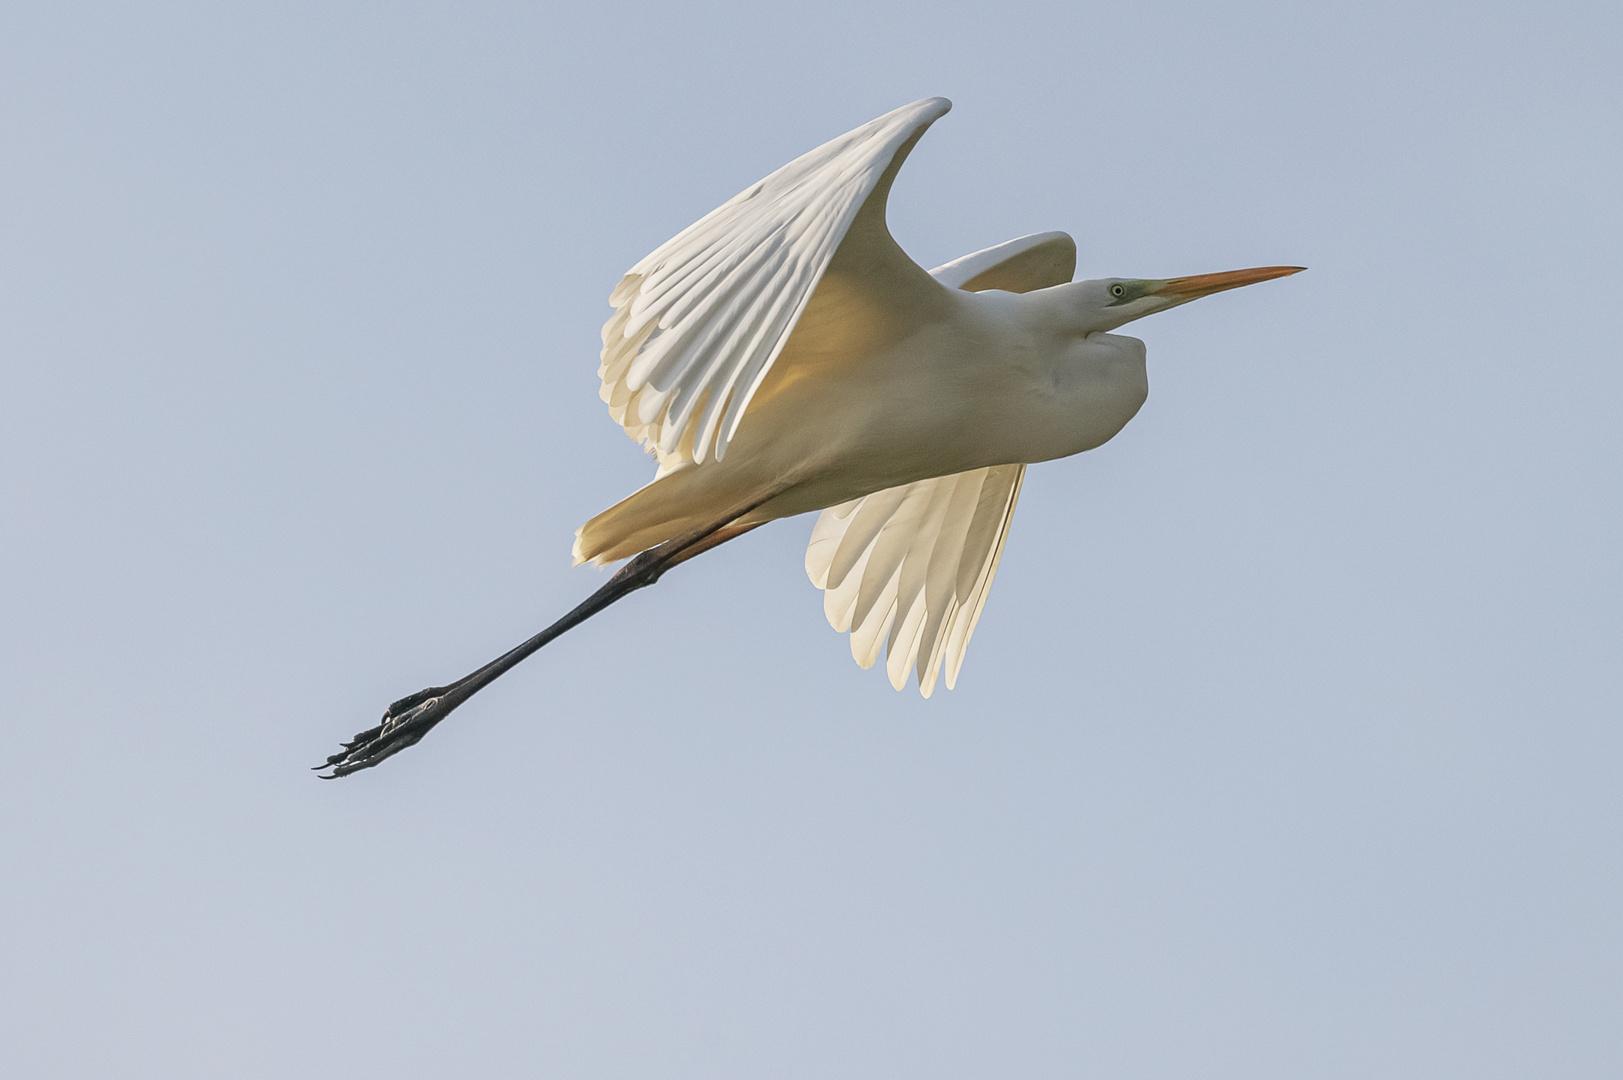 Silberreiher (Ardea alba, Syn.: Casmerodius albus, Egretta alba)